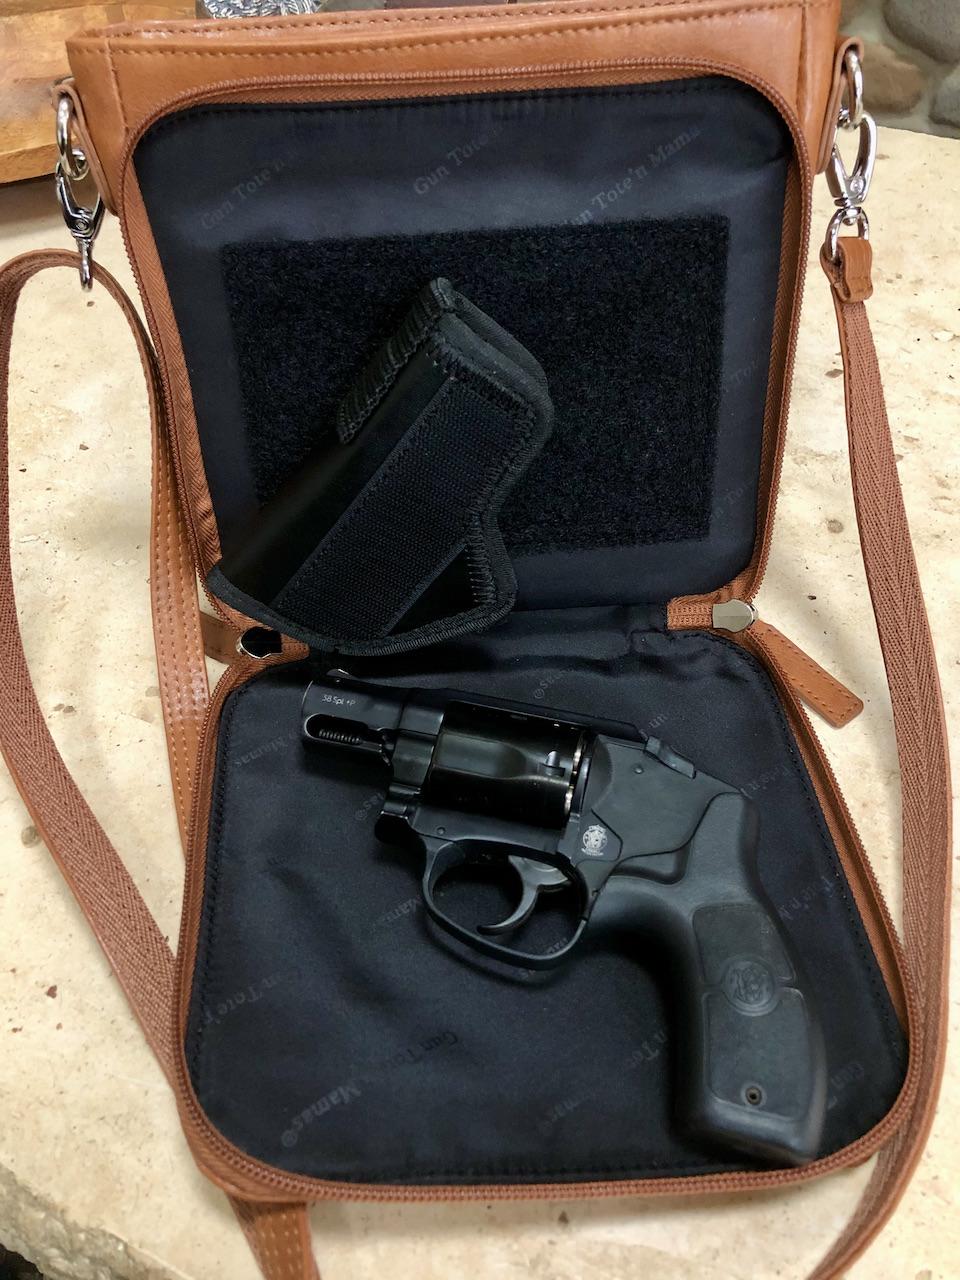 Mini Boho gun